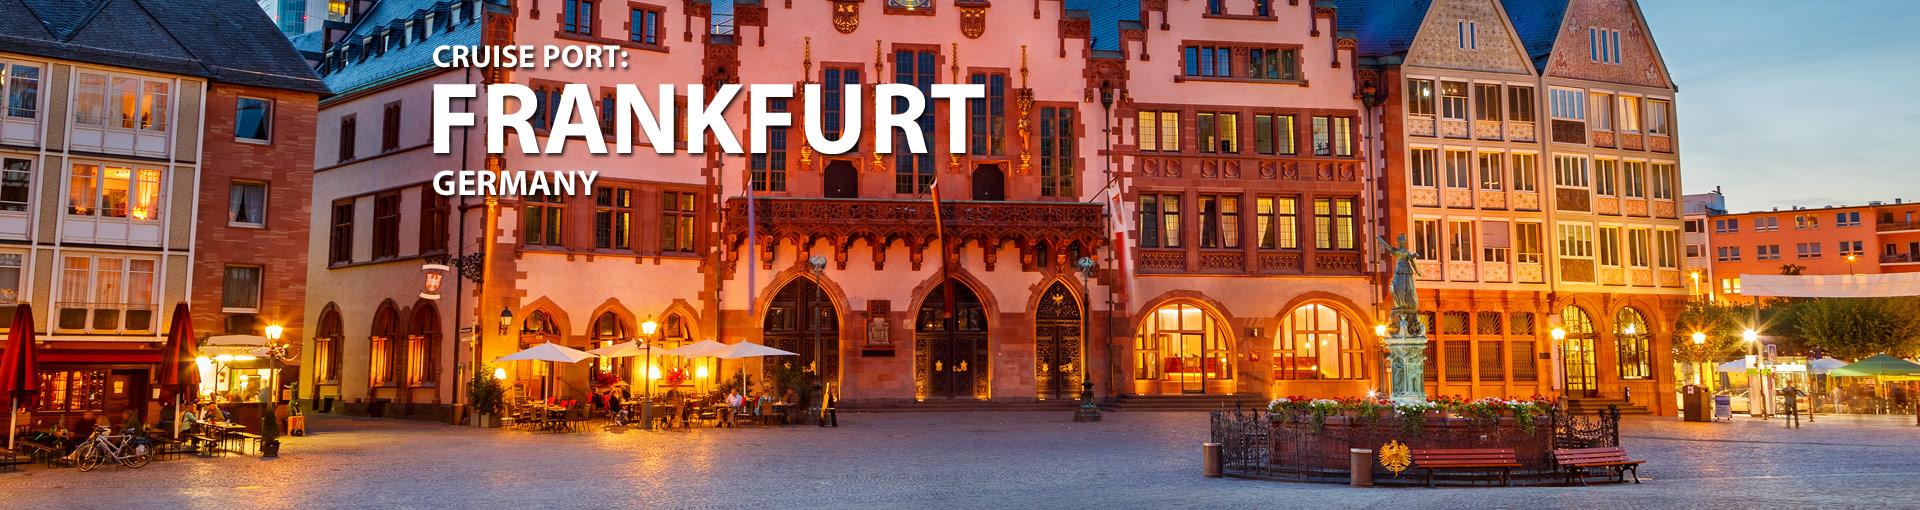 Cruises from Frankfurt, Germany